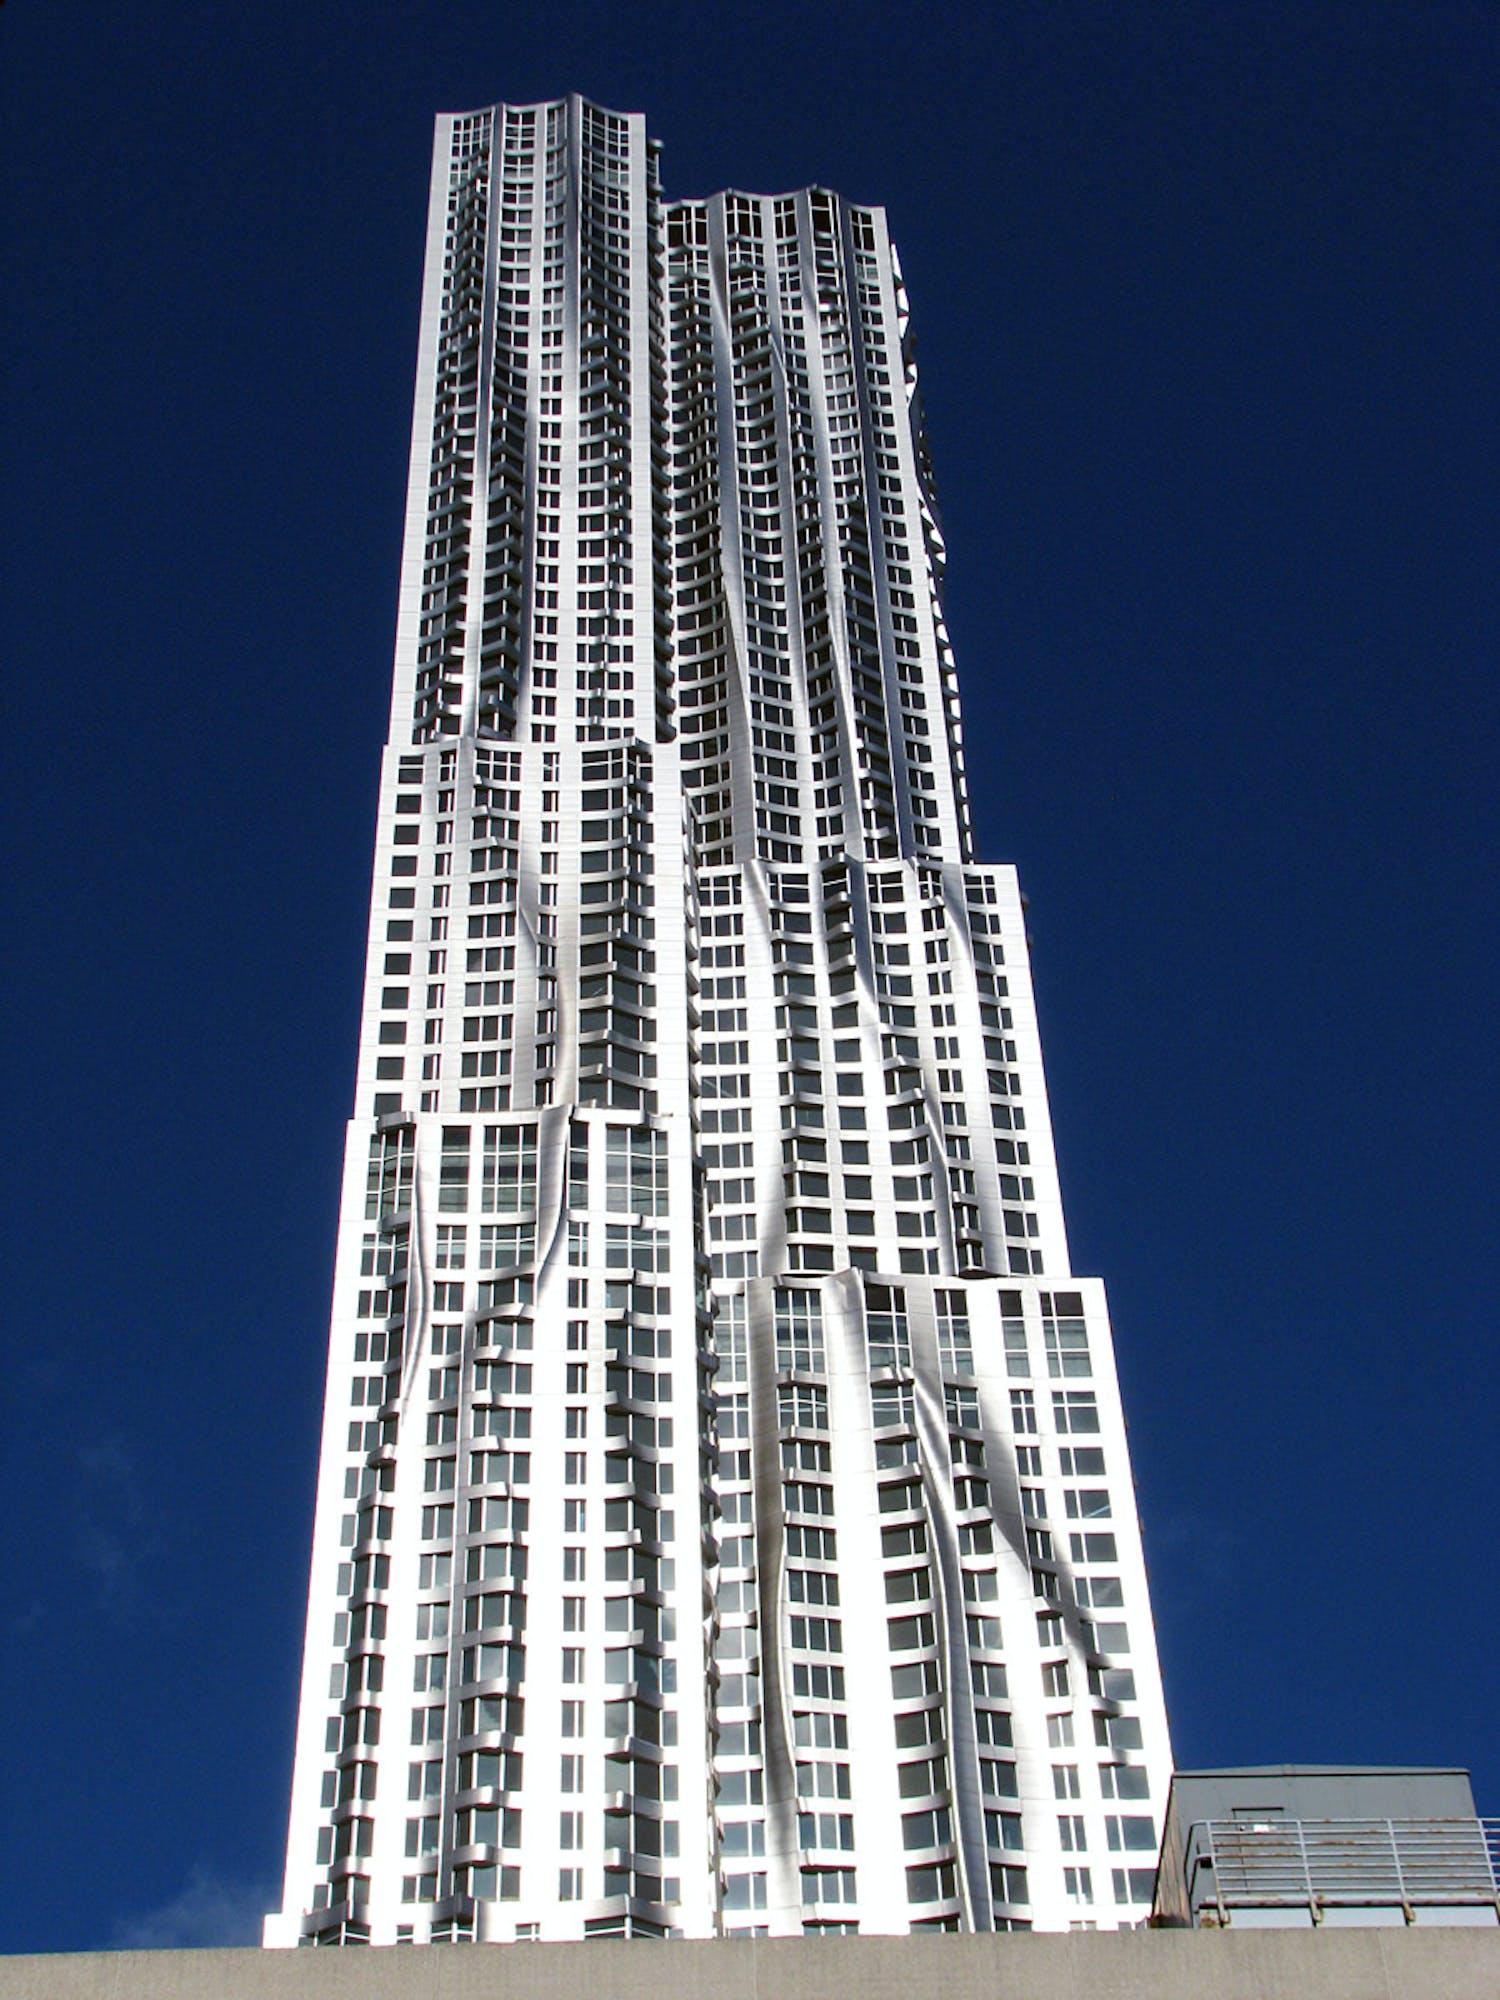 Gehry's 8 Spruce Street Wins Emporis Skyscraper AwardGehry's 8 Spruce Street Wins Emporis Skyscraper Award